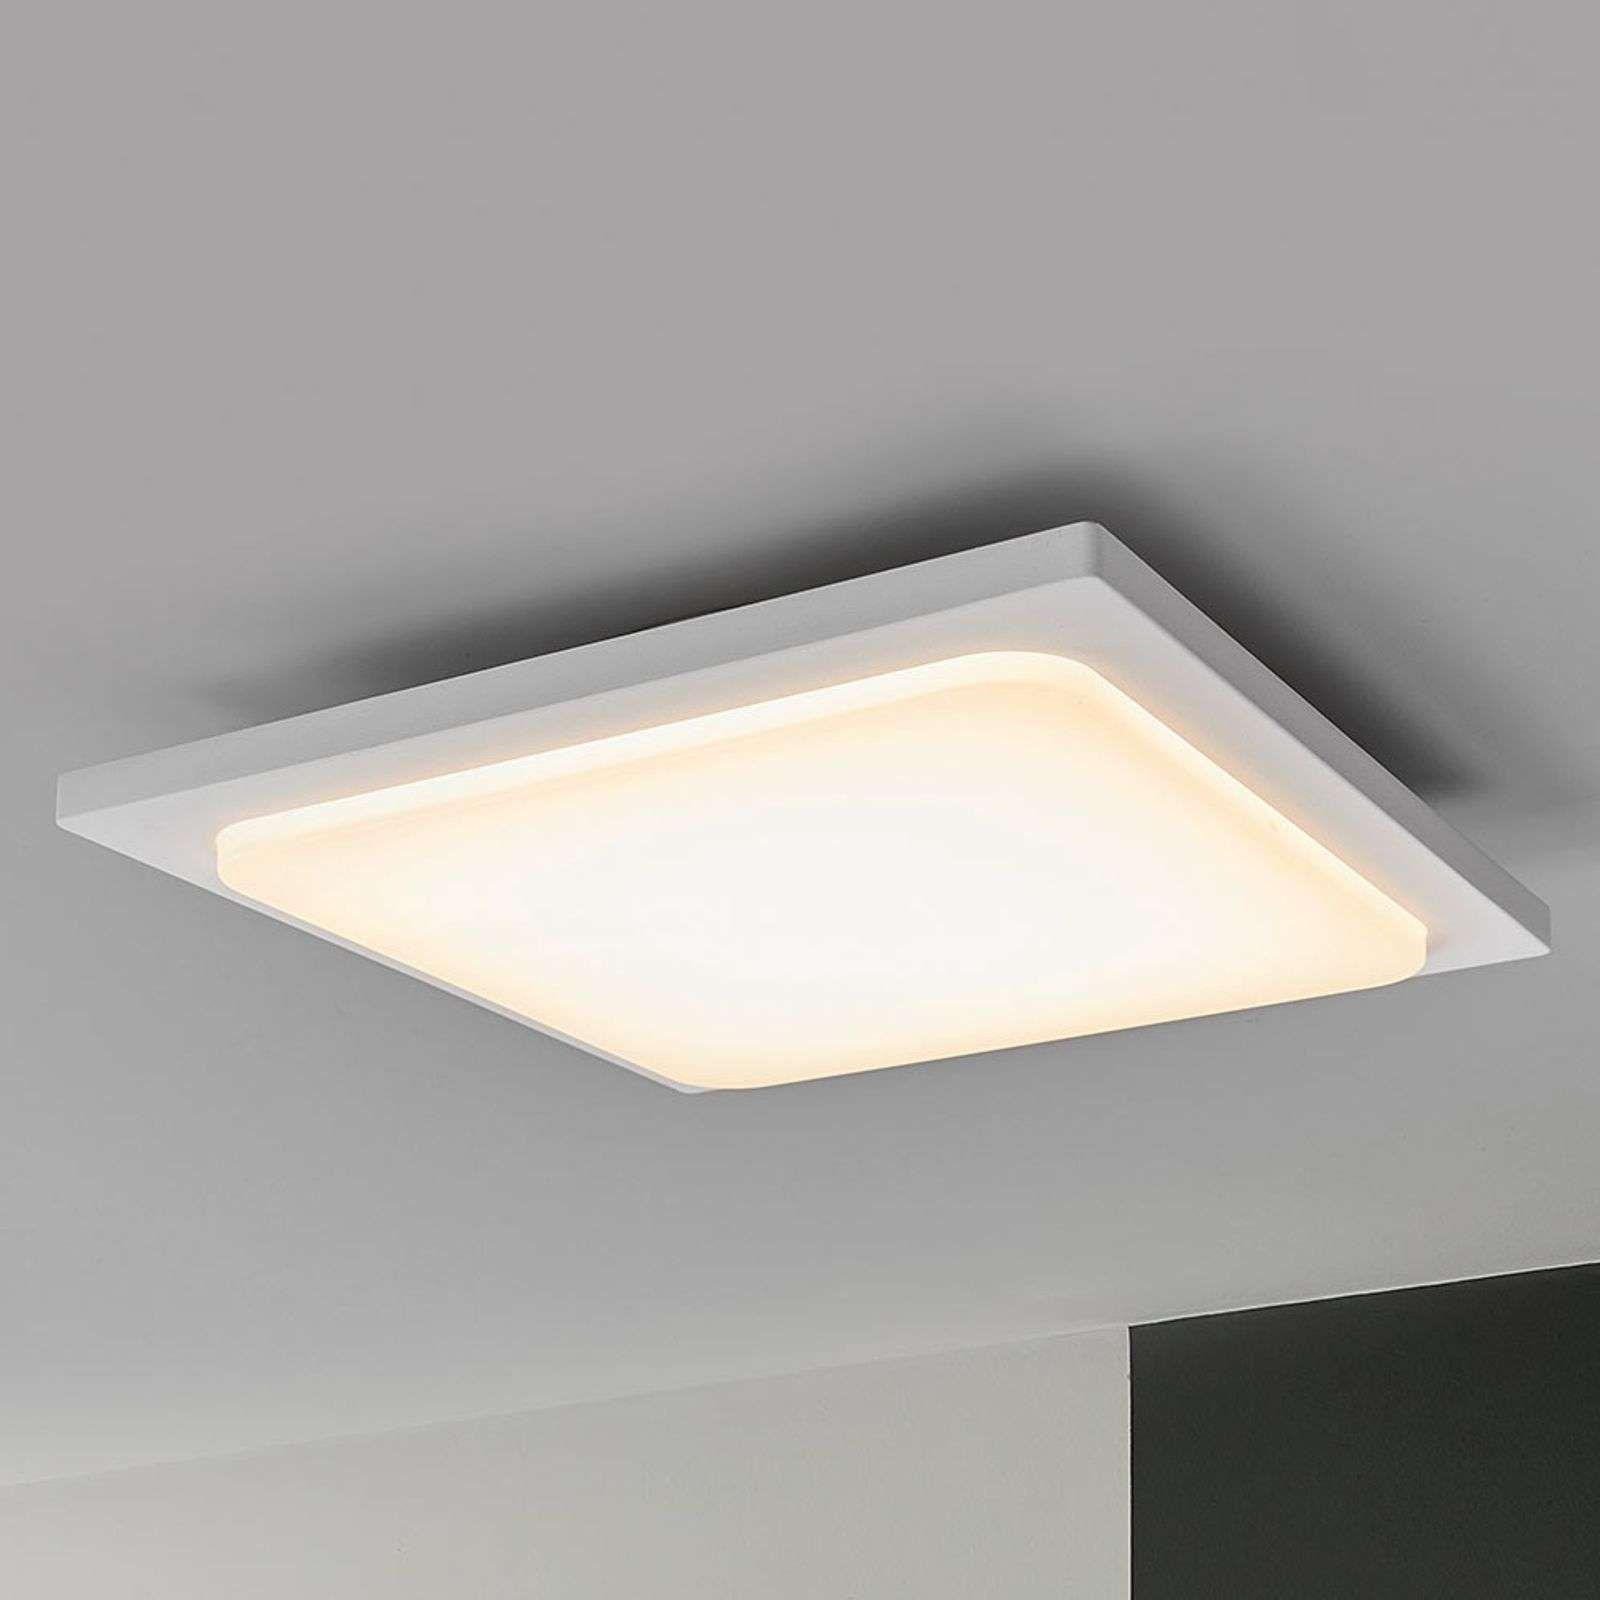 Zware Plafondlamp Ophangen Plafondverlichting Modern